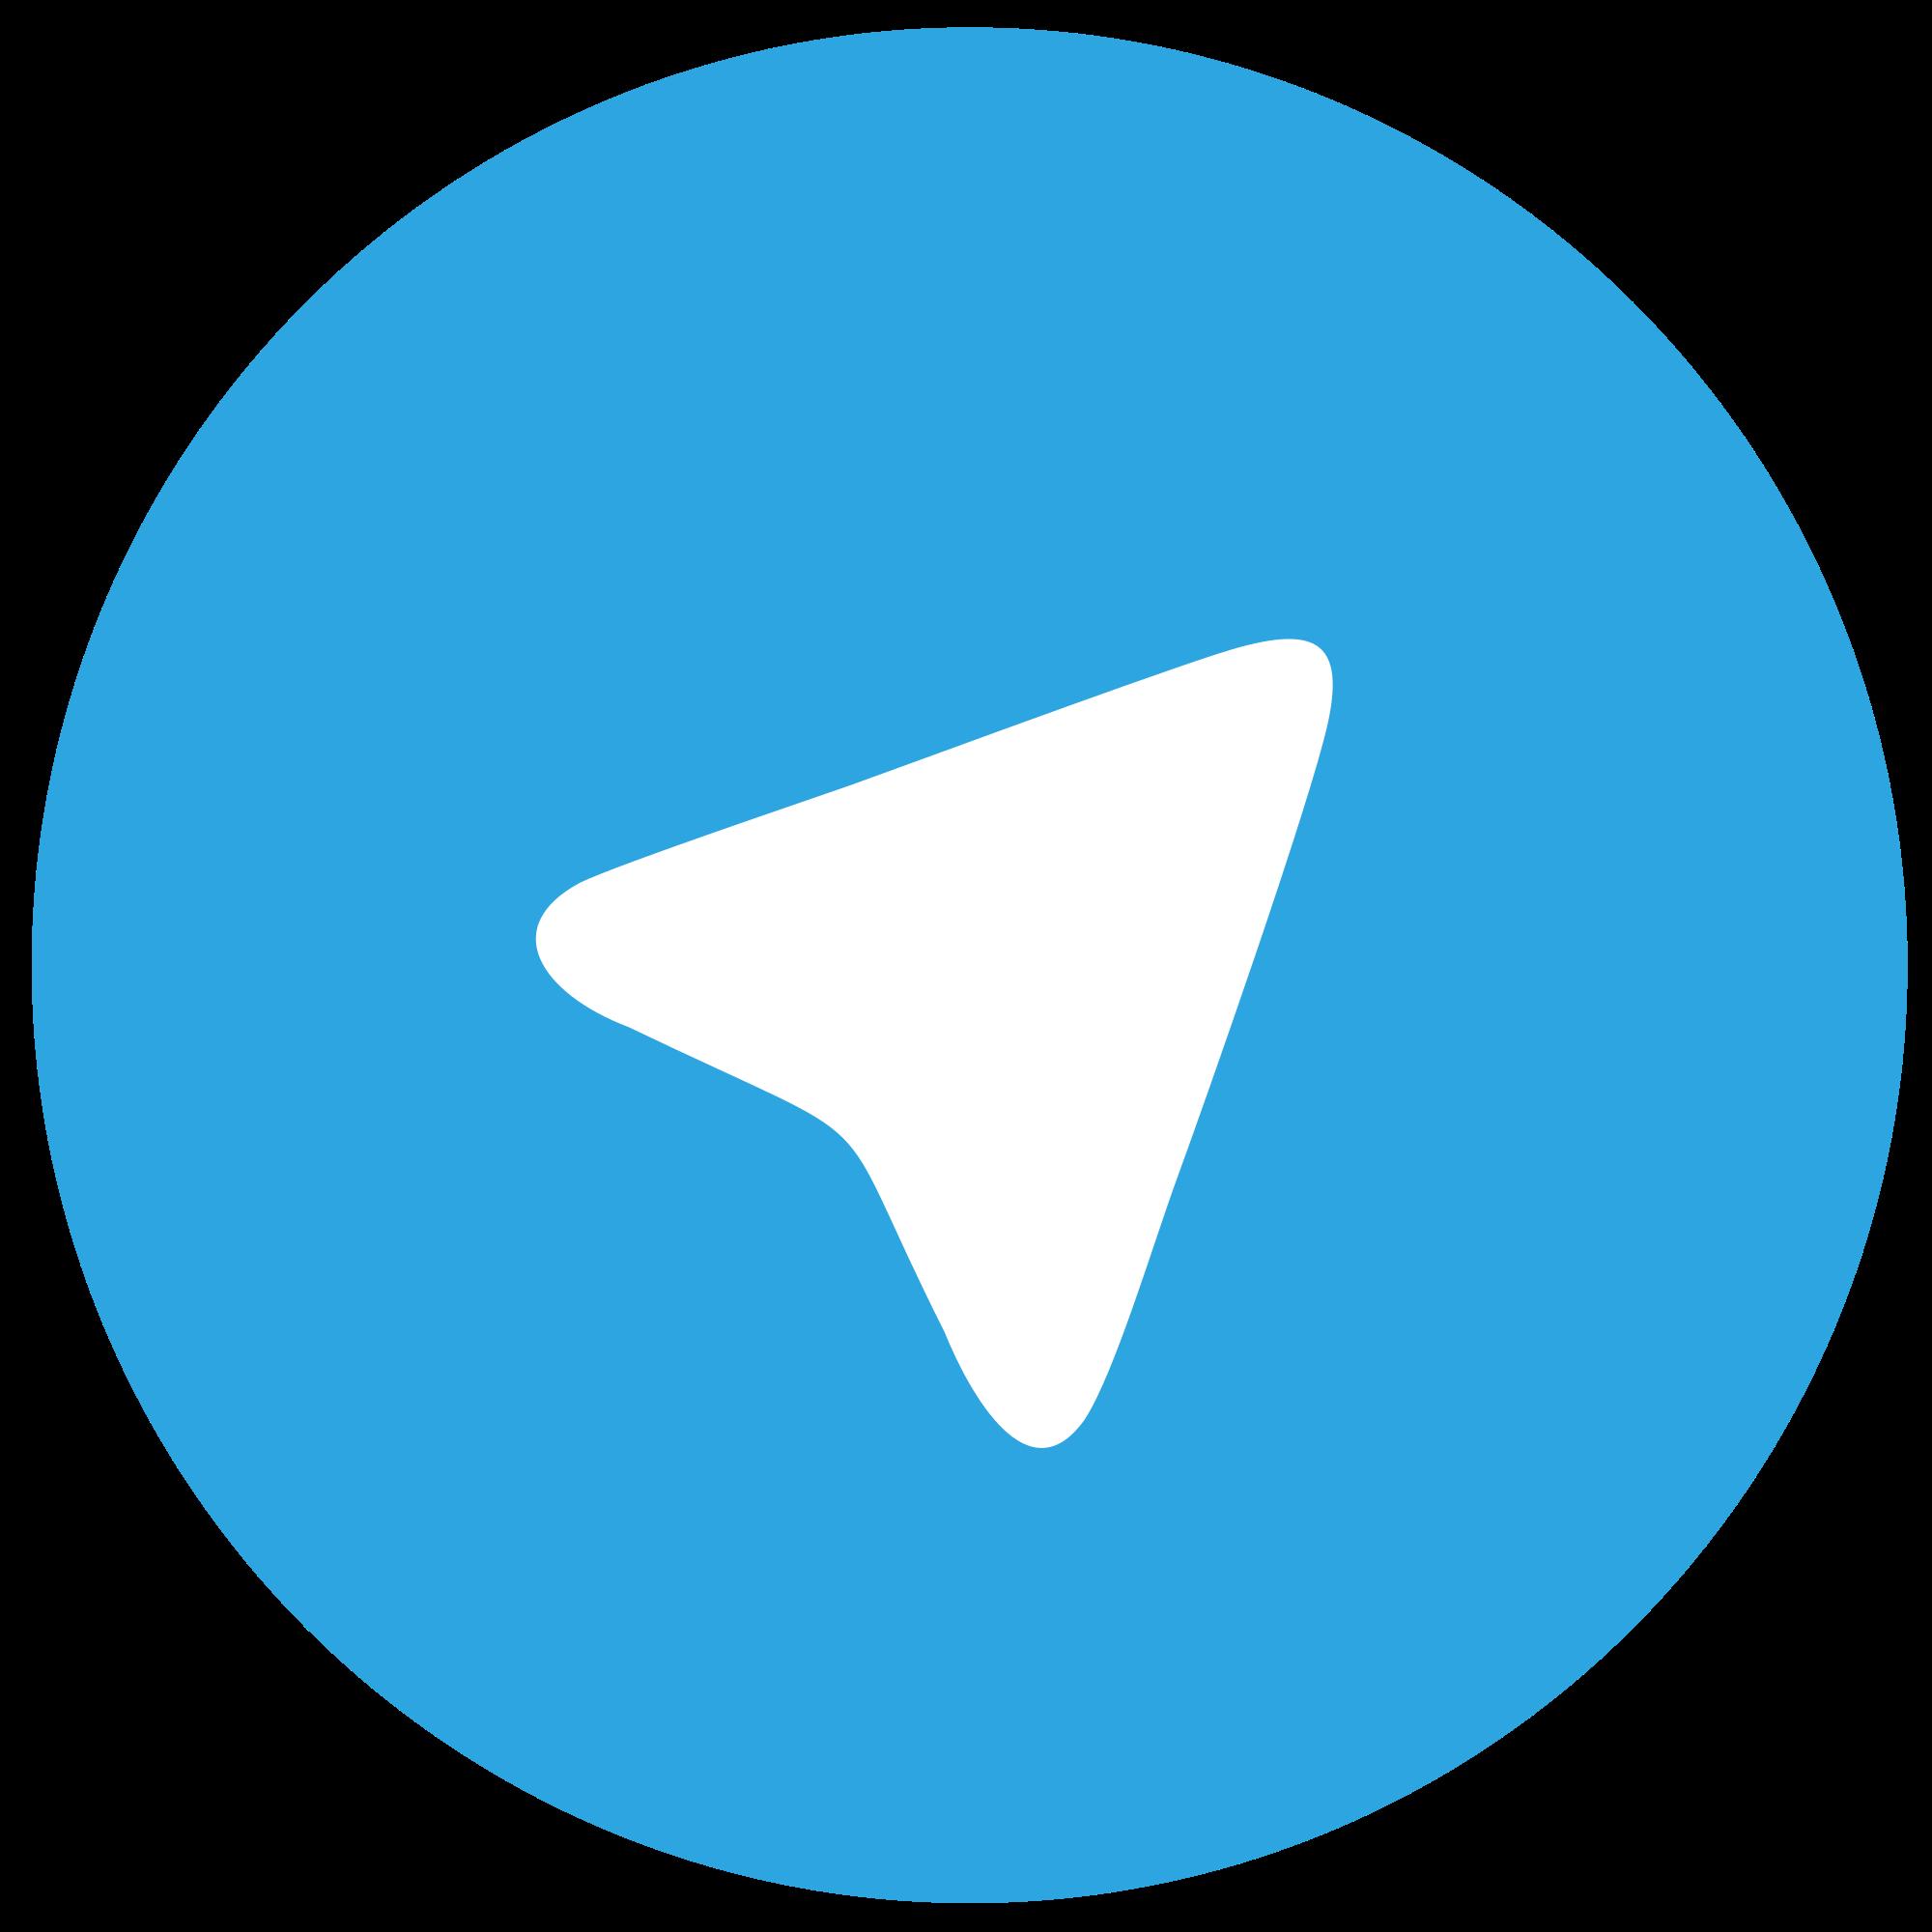 telegram-clip-art-25